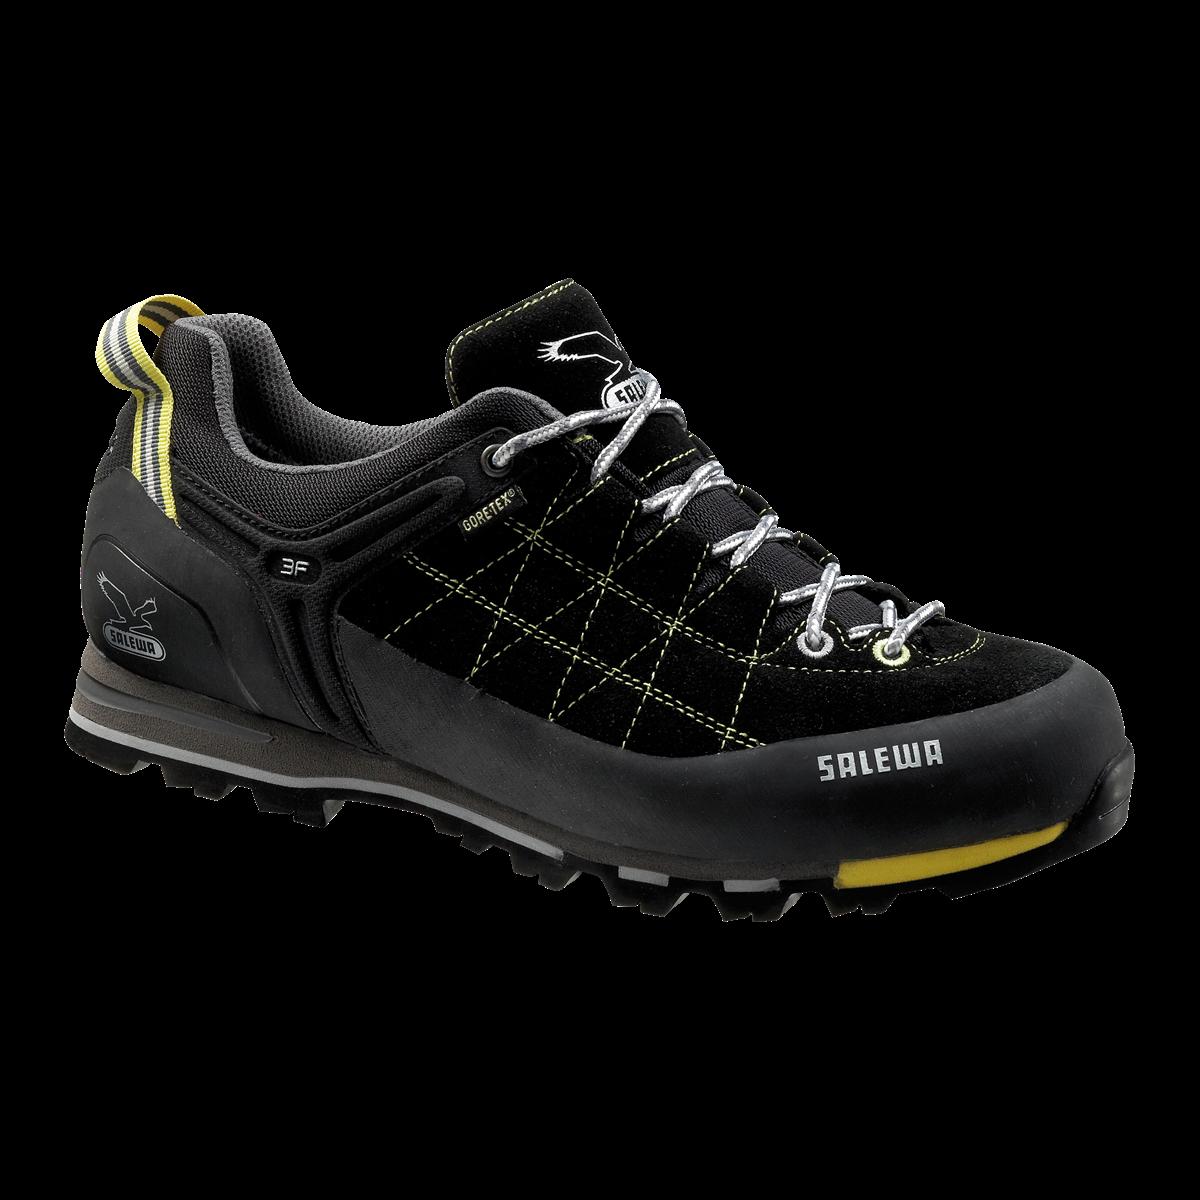 Salewa Mountain Trainer GTX £109.00 | Best hiking shoes